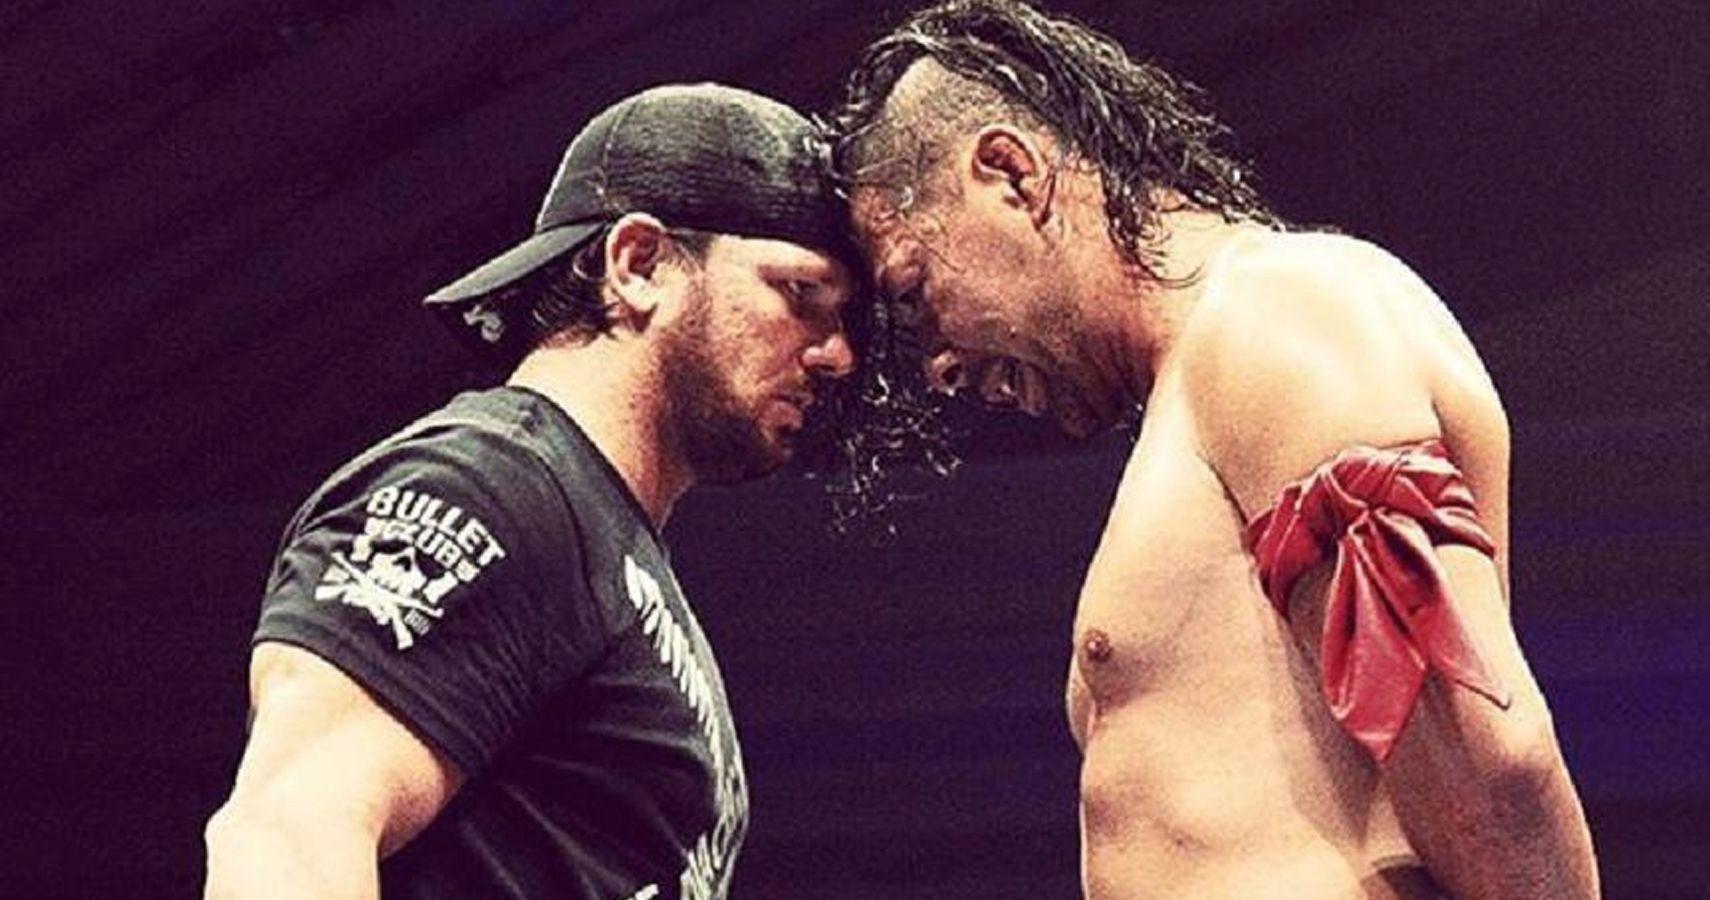 Top 15 Shinsuke Nakamura Matches We NEED To See In WWE